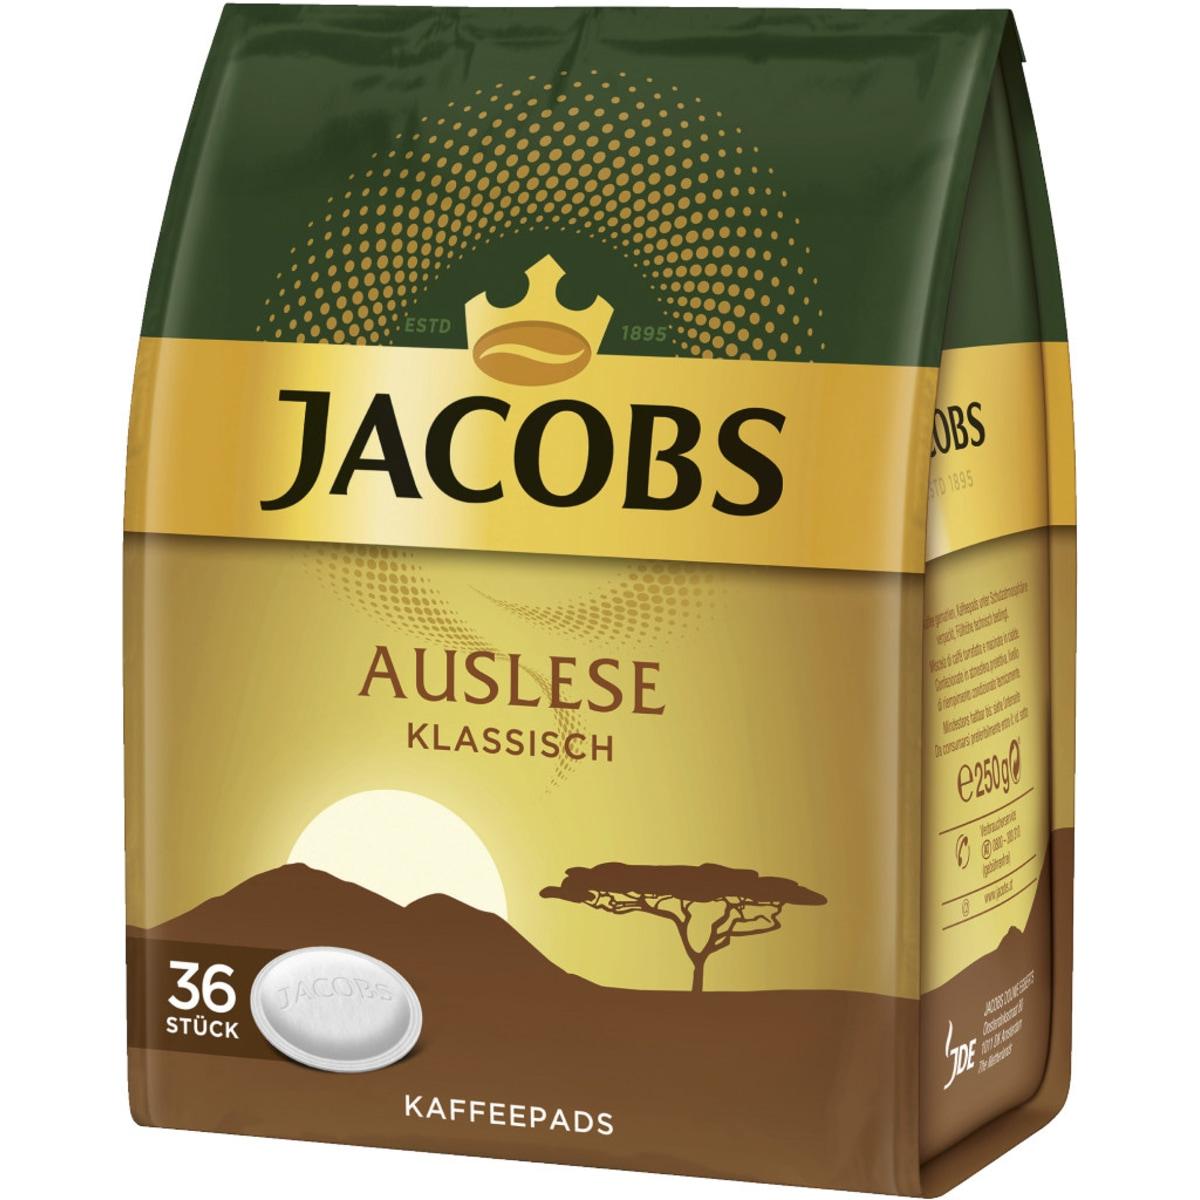 Jacobs Auslese Kaffee Pads